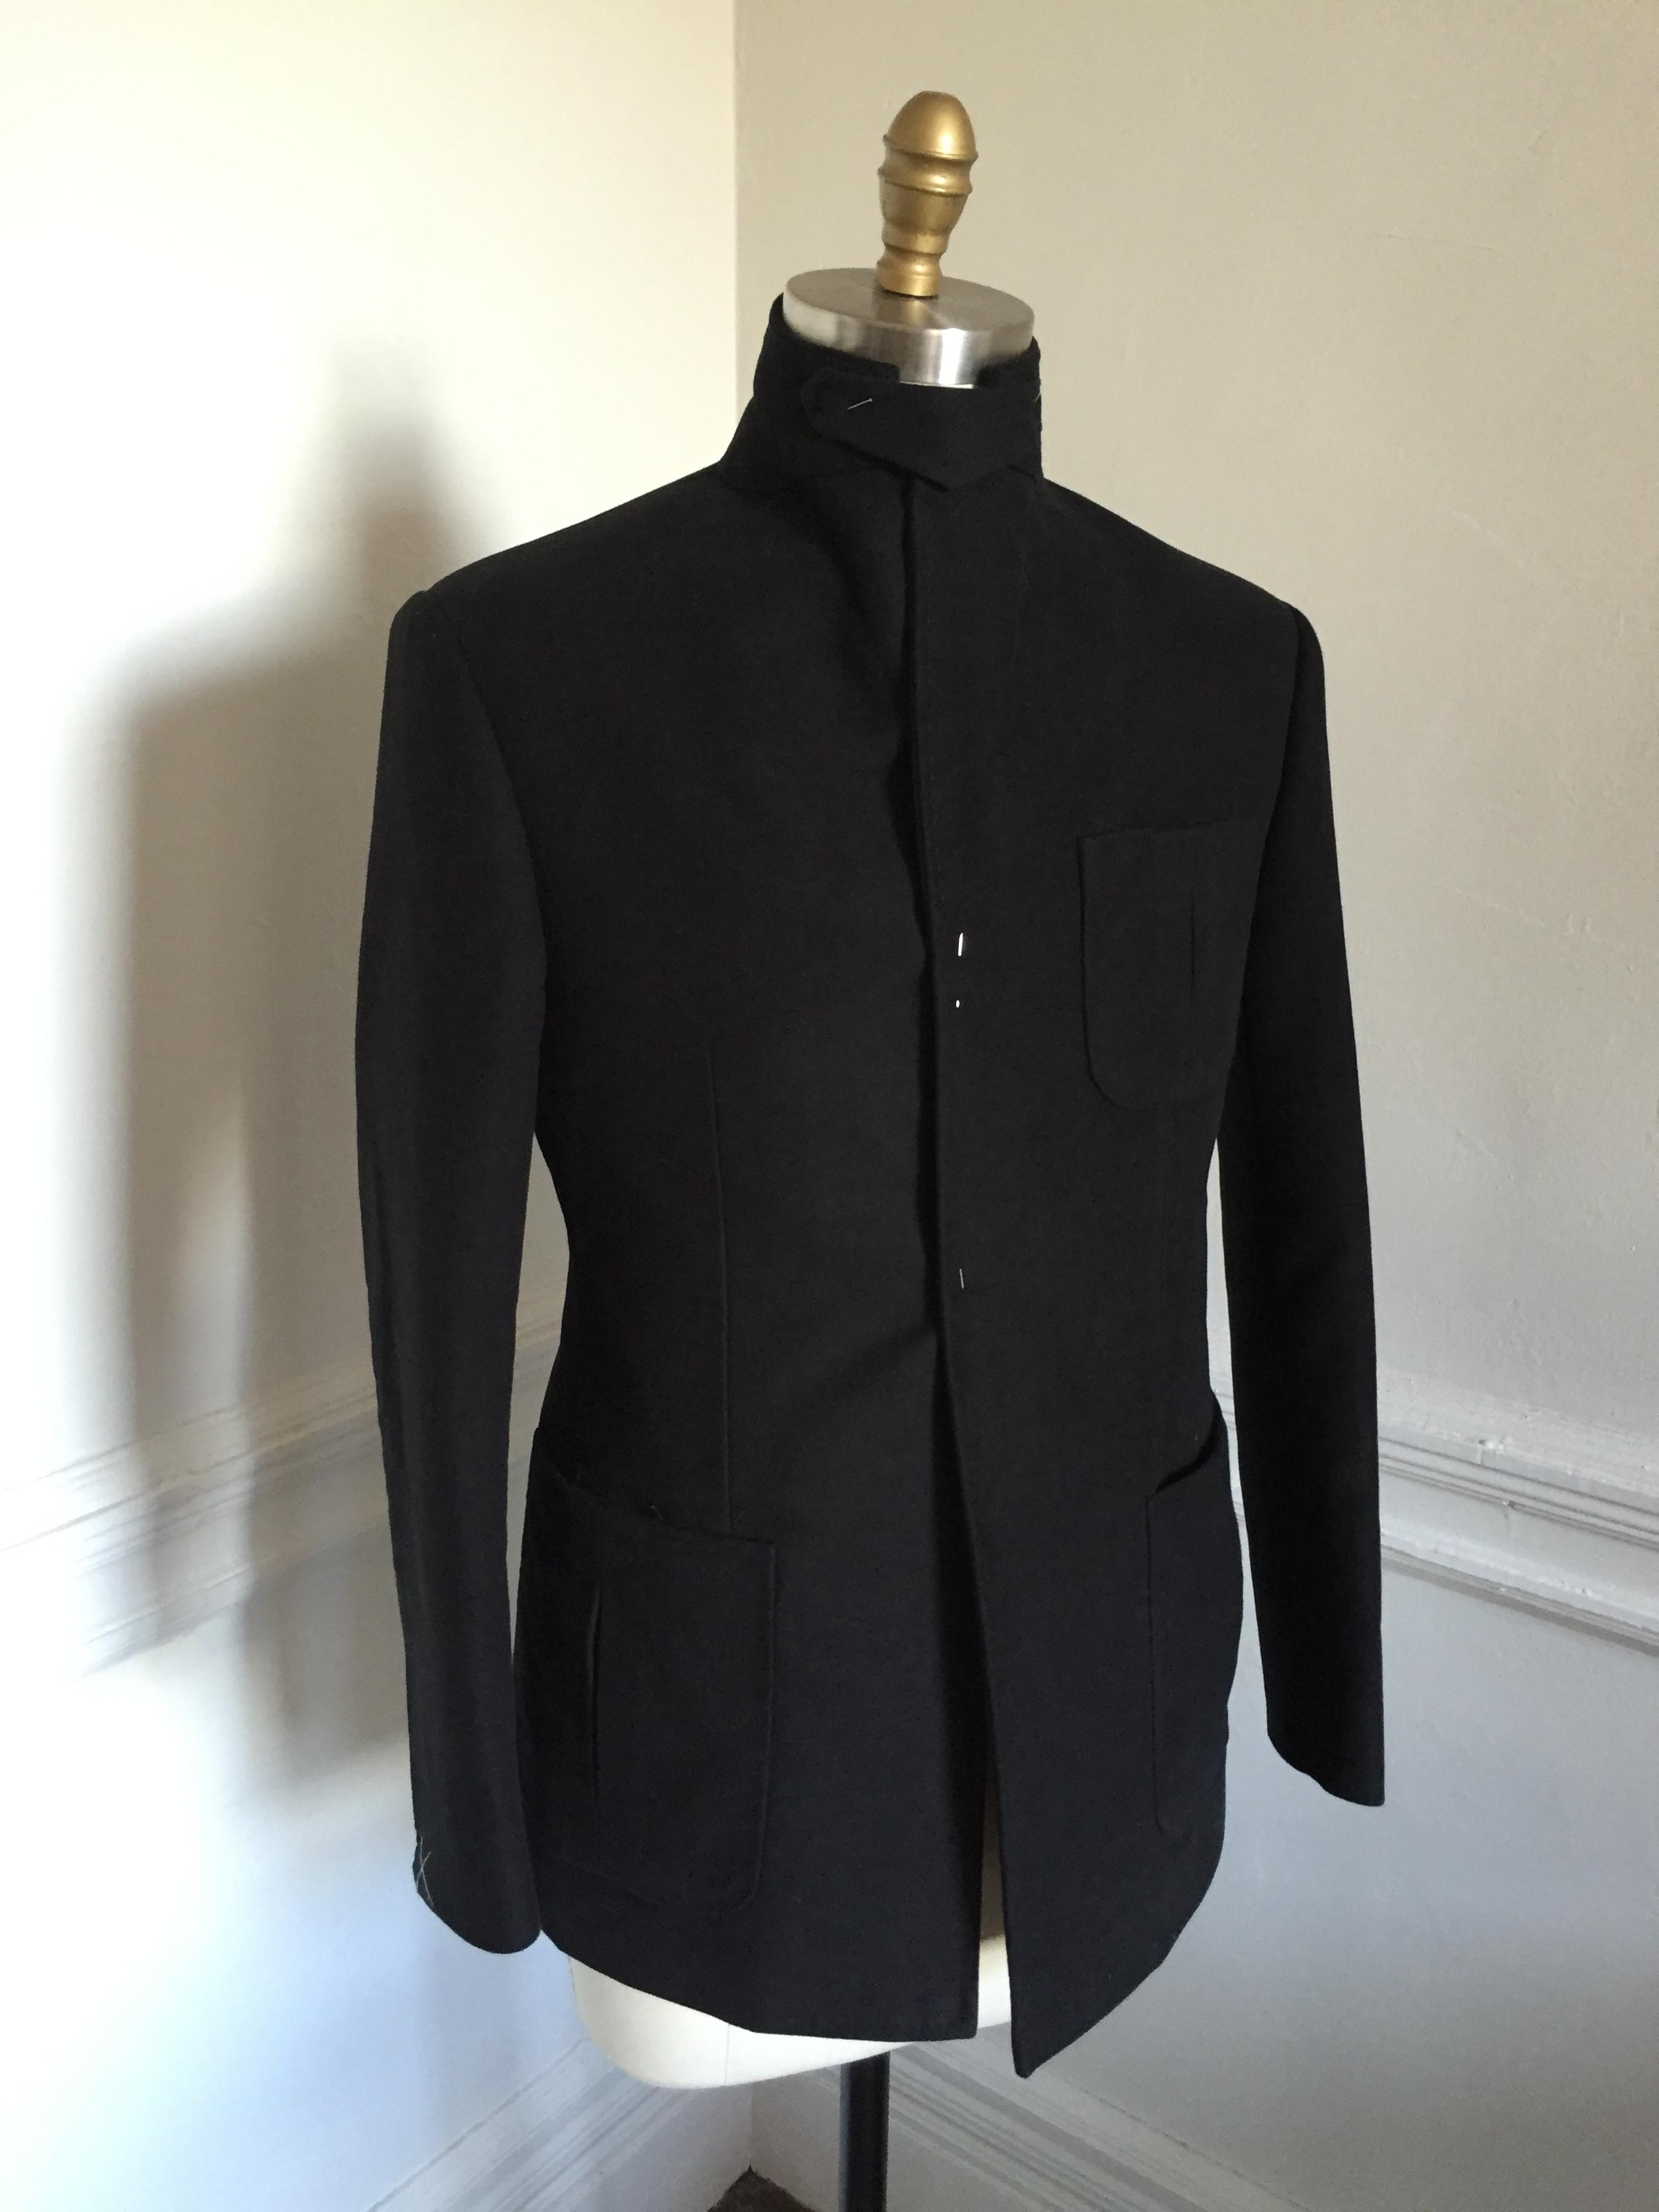 Moleskin jacket.JPG